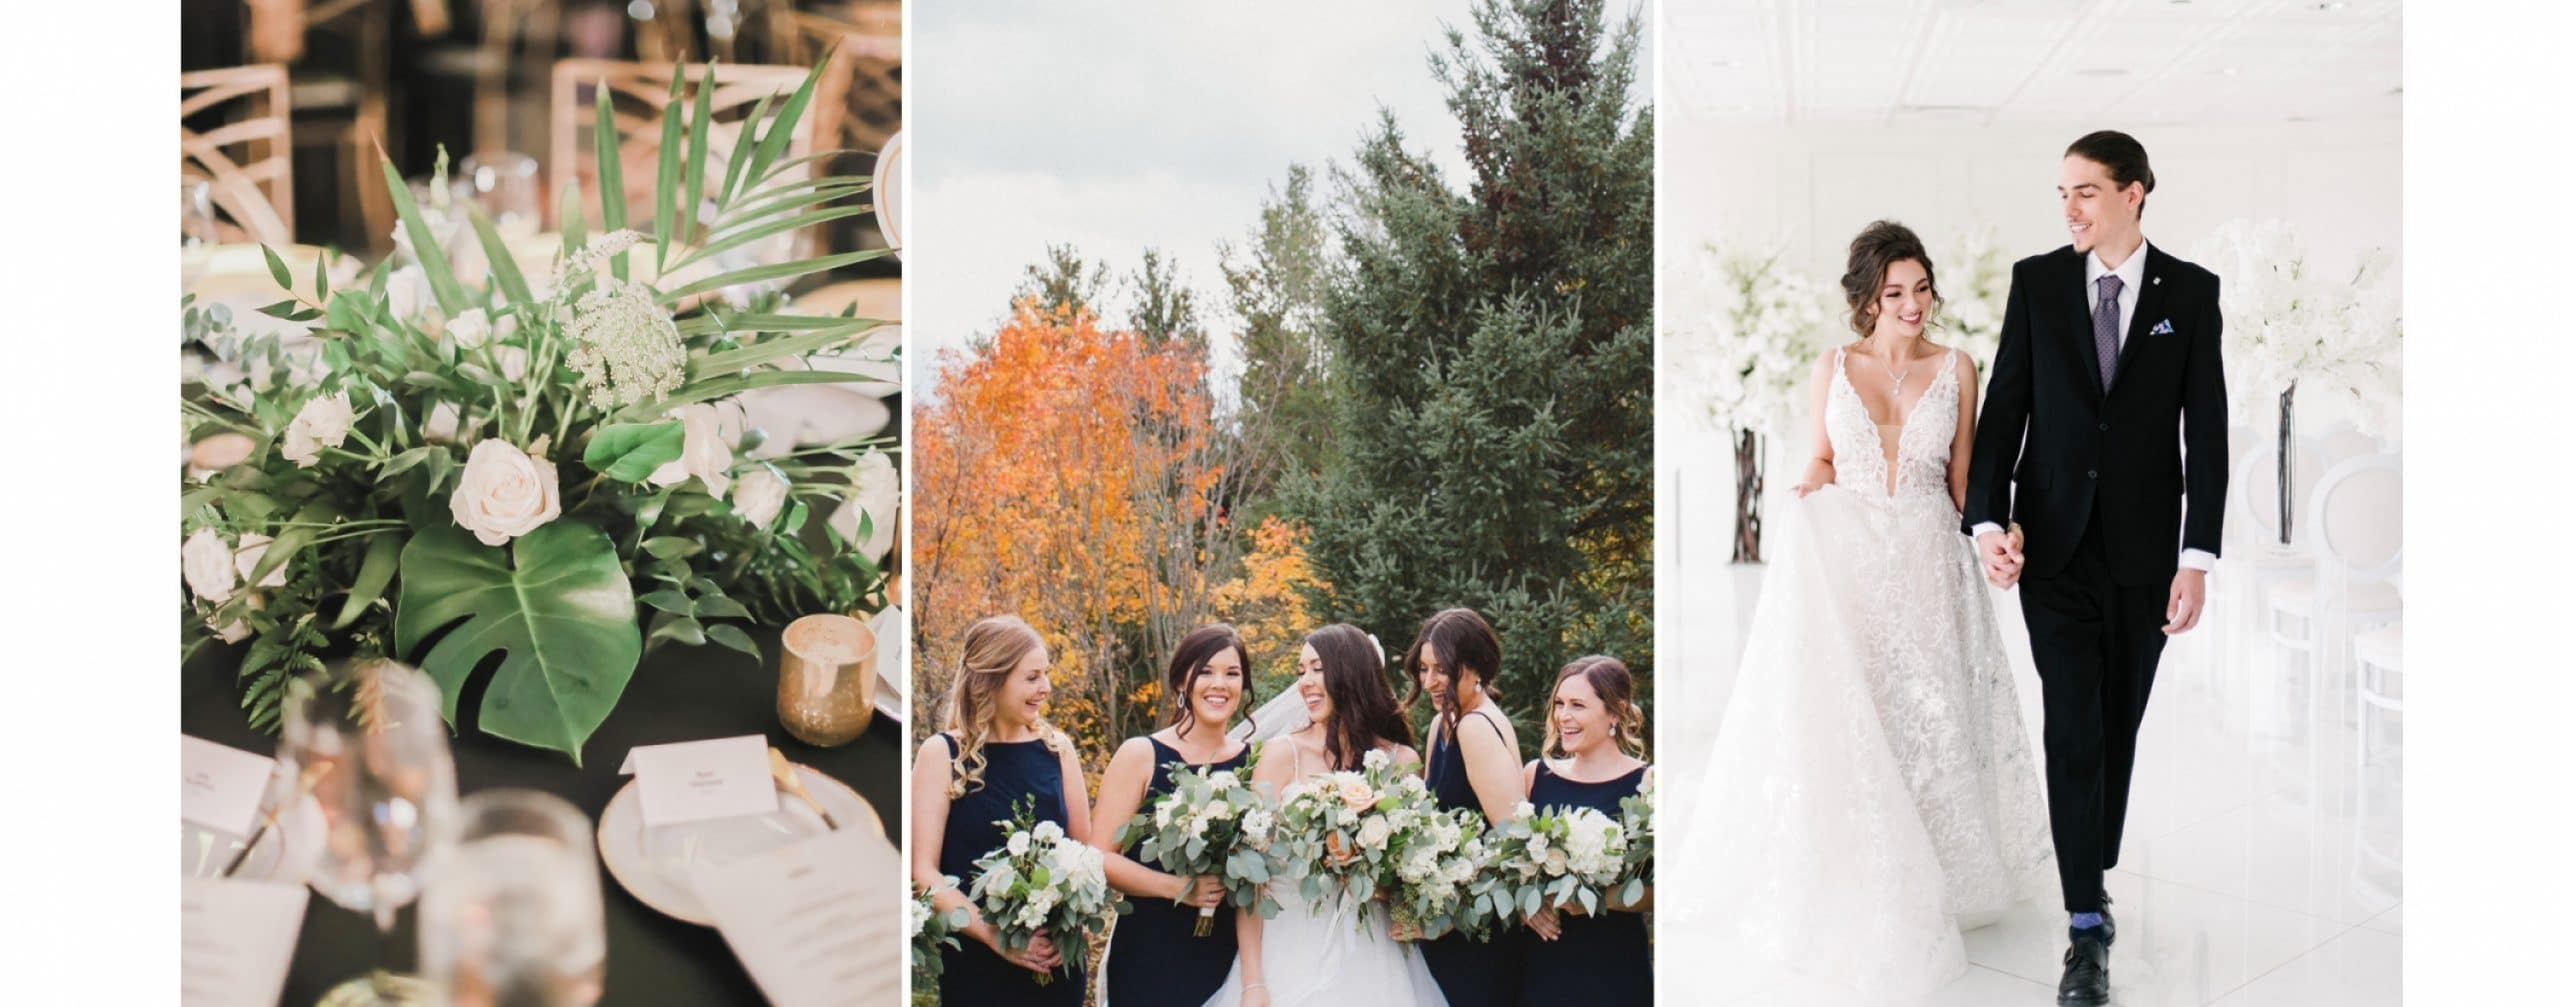 wildbash events micro wedding